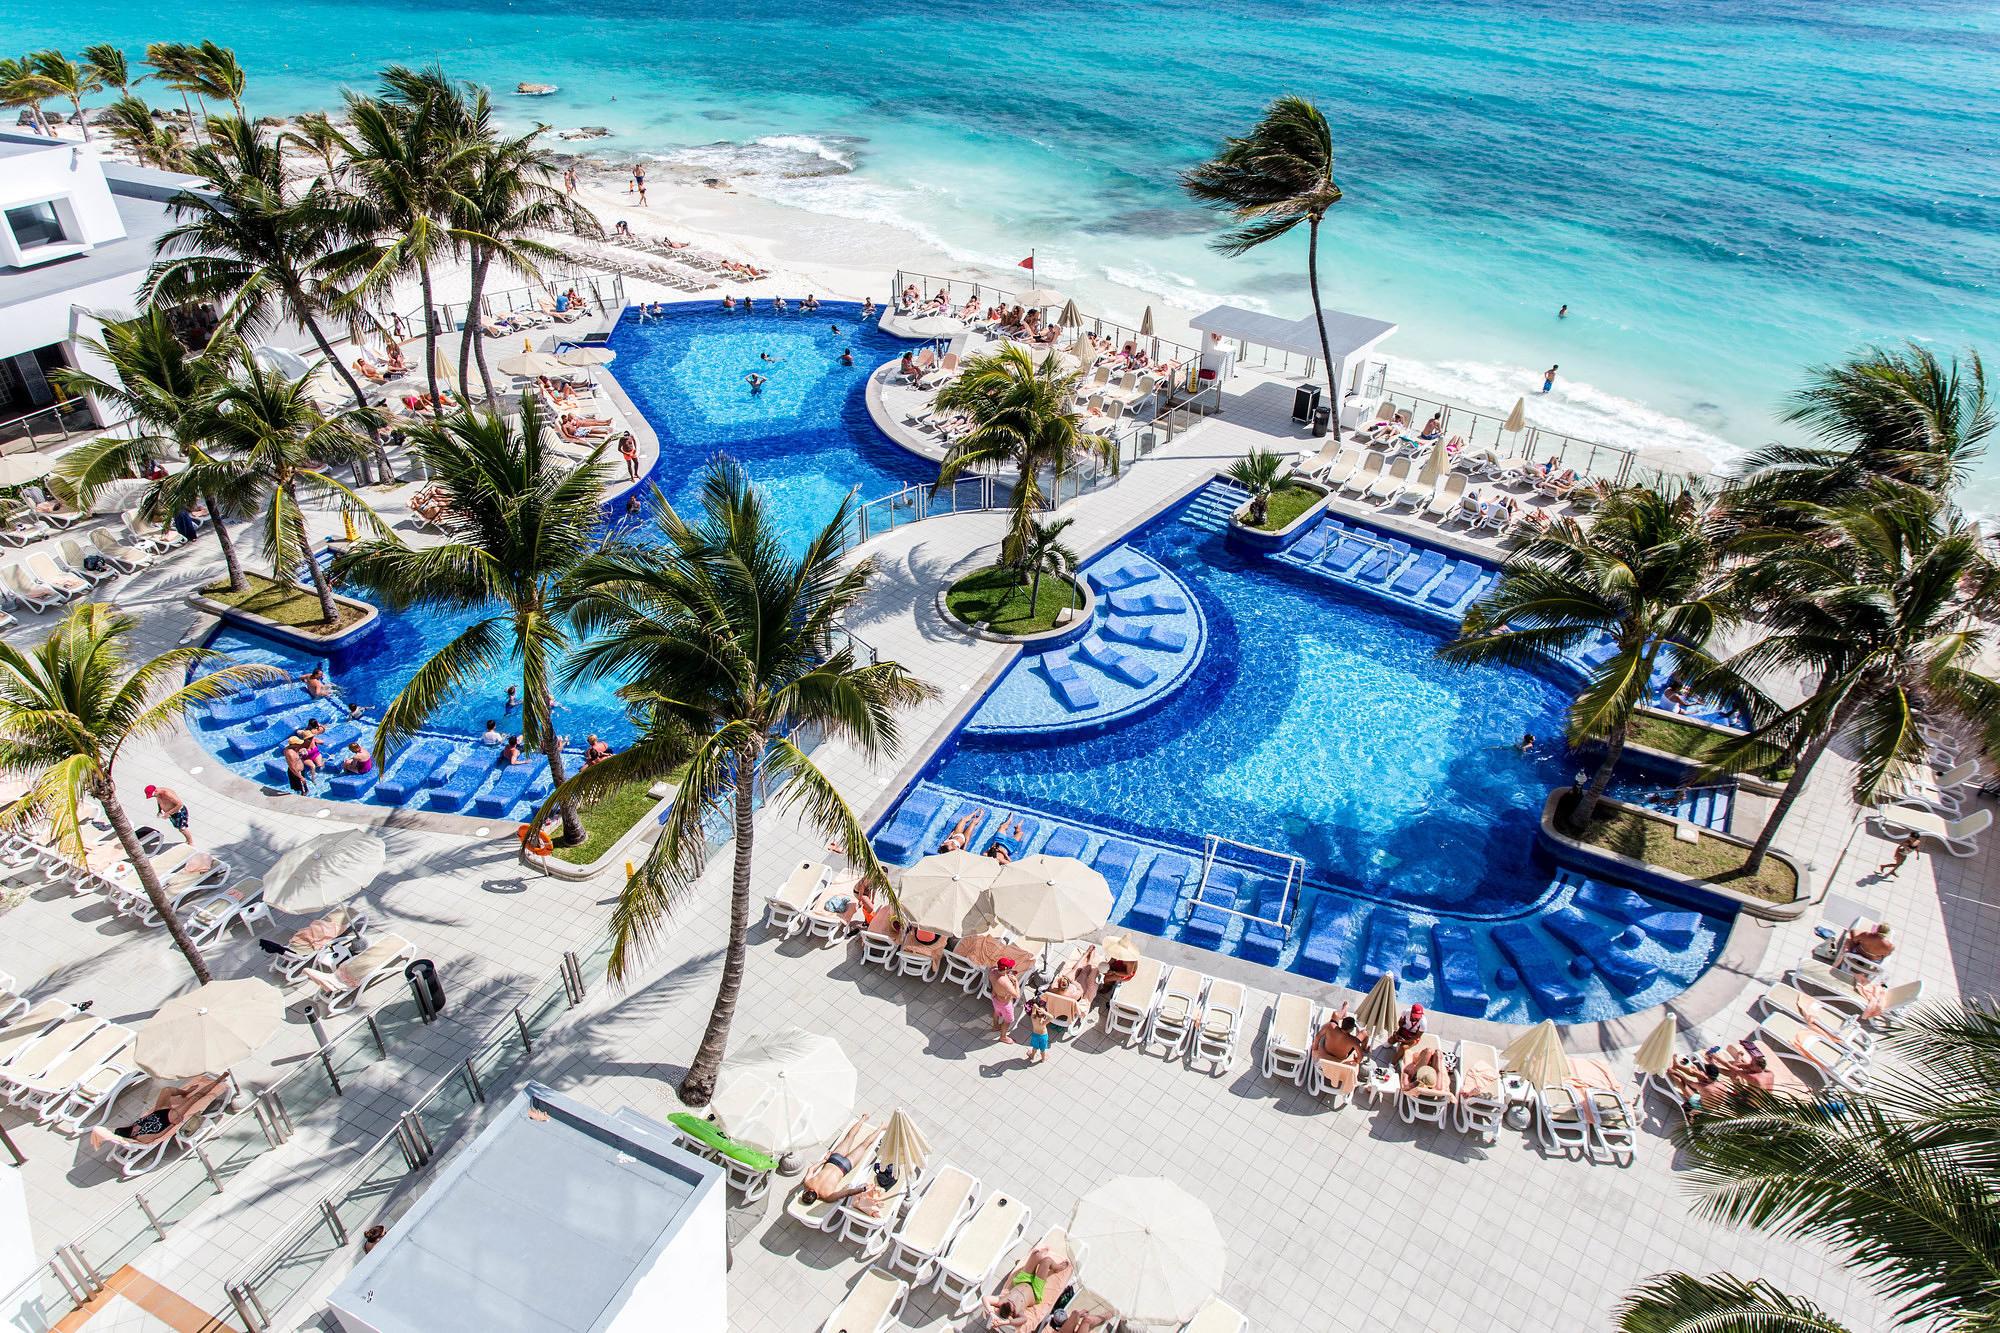 The pool and beach at Hotel Riu Cancun